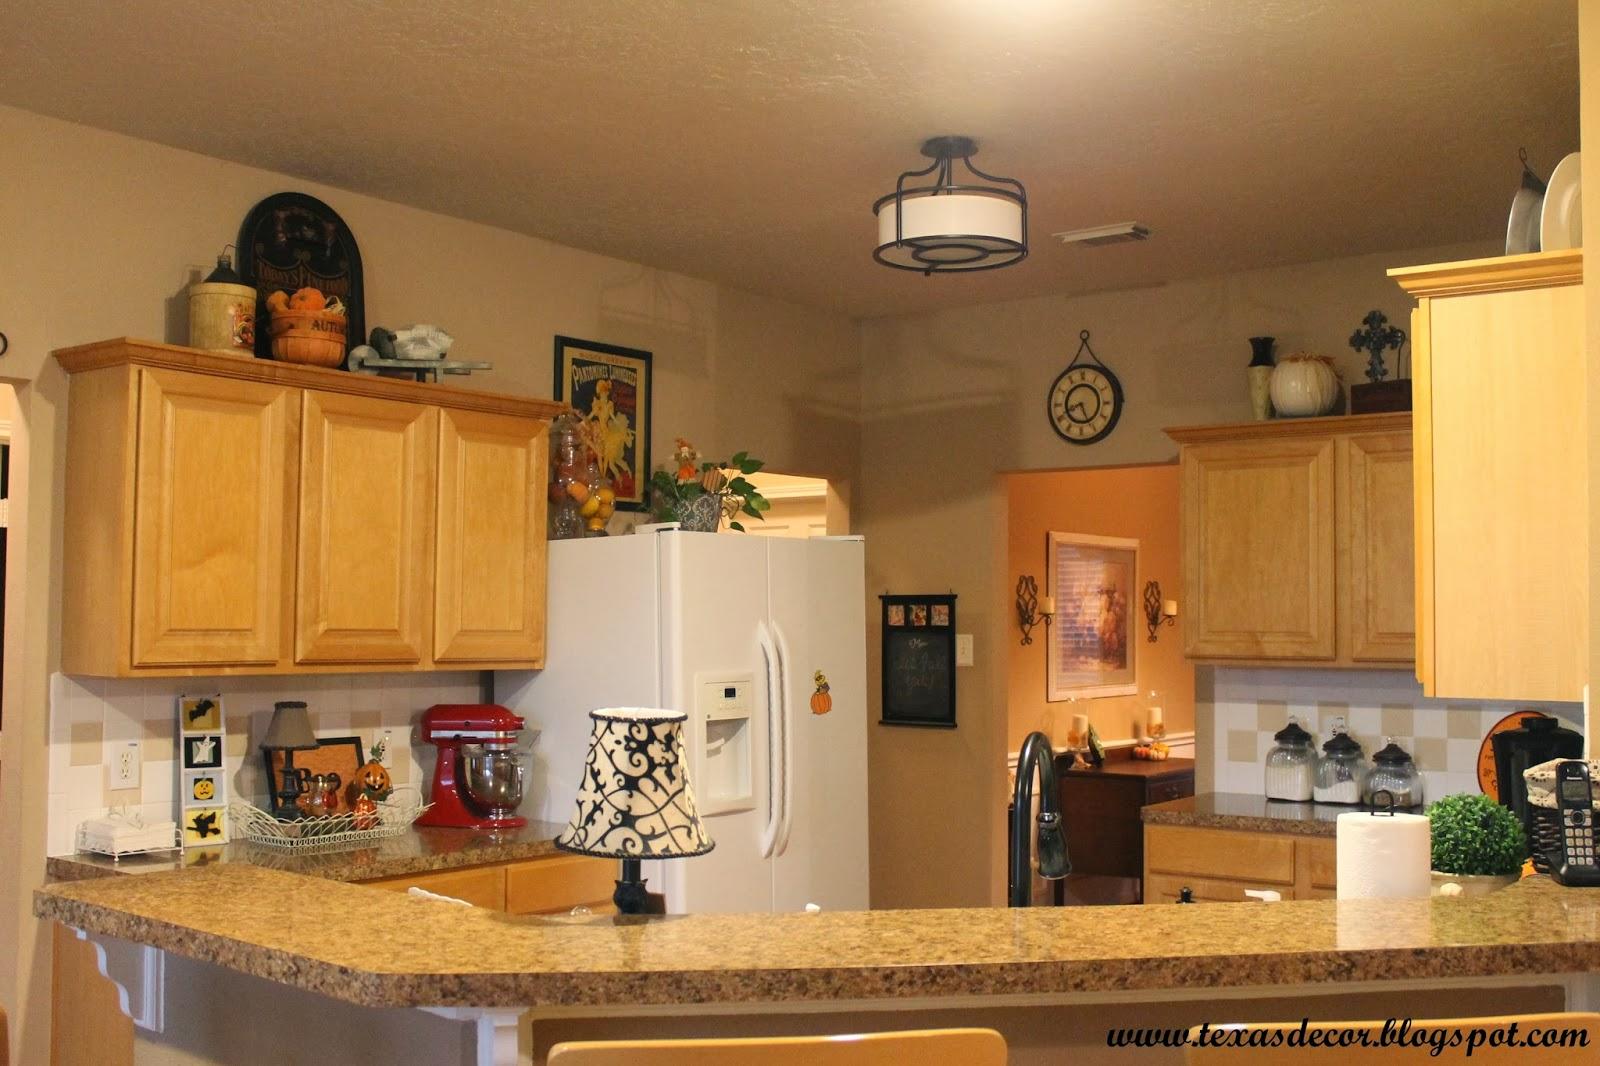 Http Texasdecor Blogspot Com 2013 10 A New Kitchen Light Html